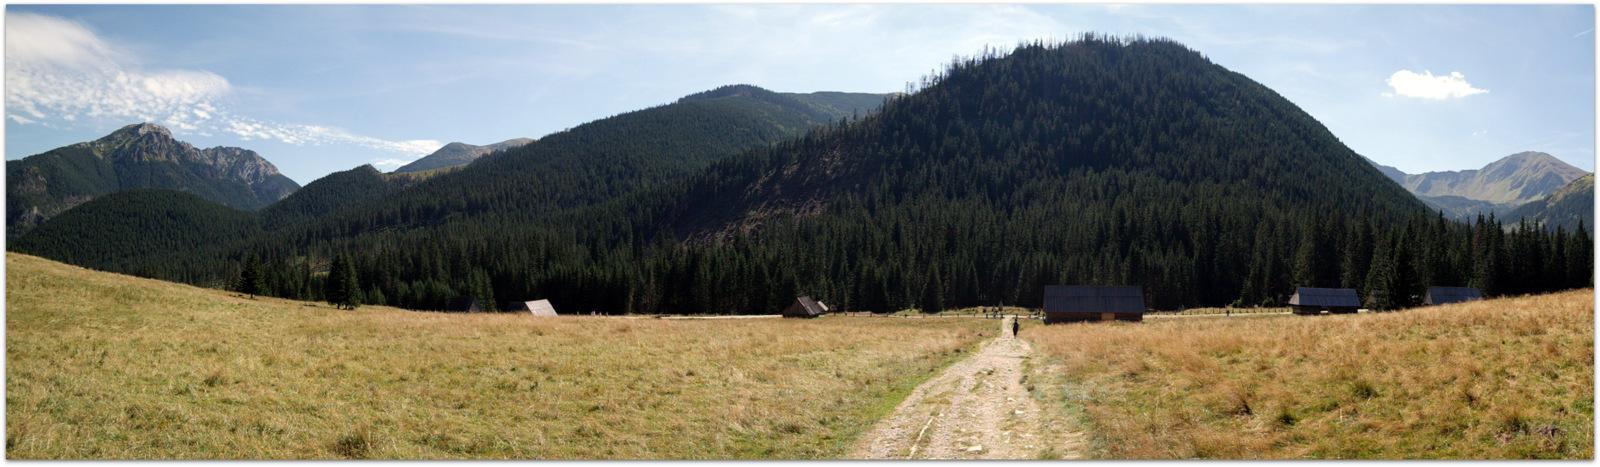 Chochołowska Valley